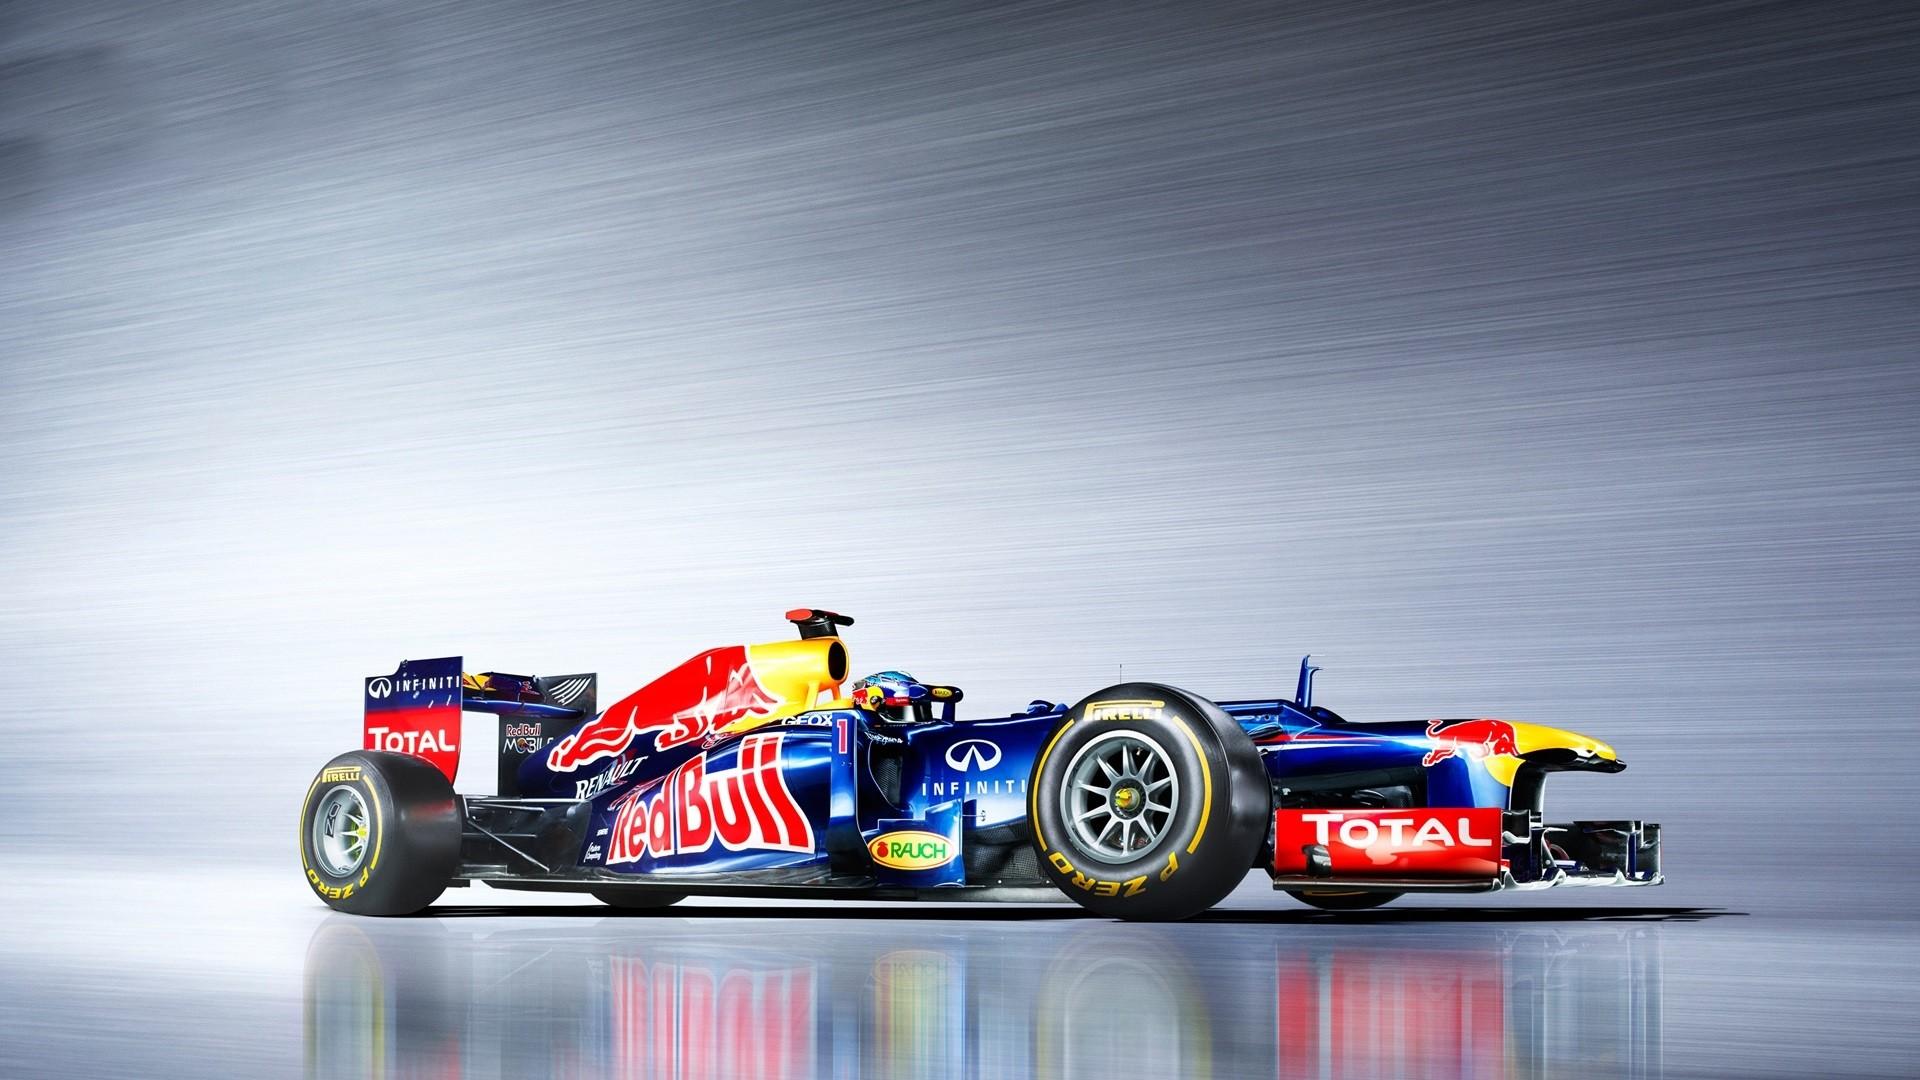 Formula 1 Wallpaper image hd